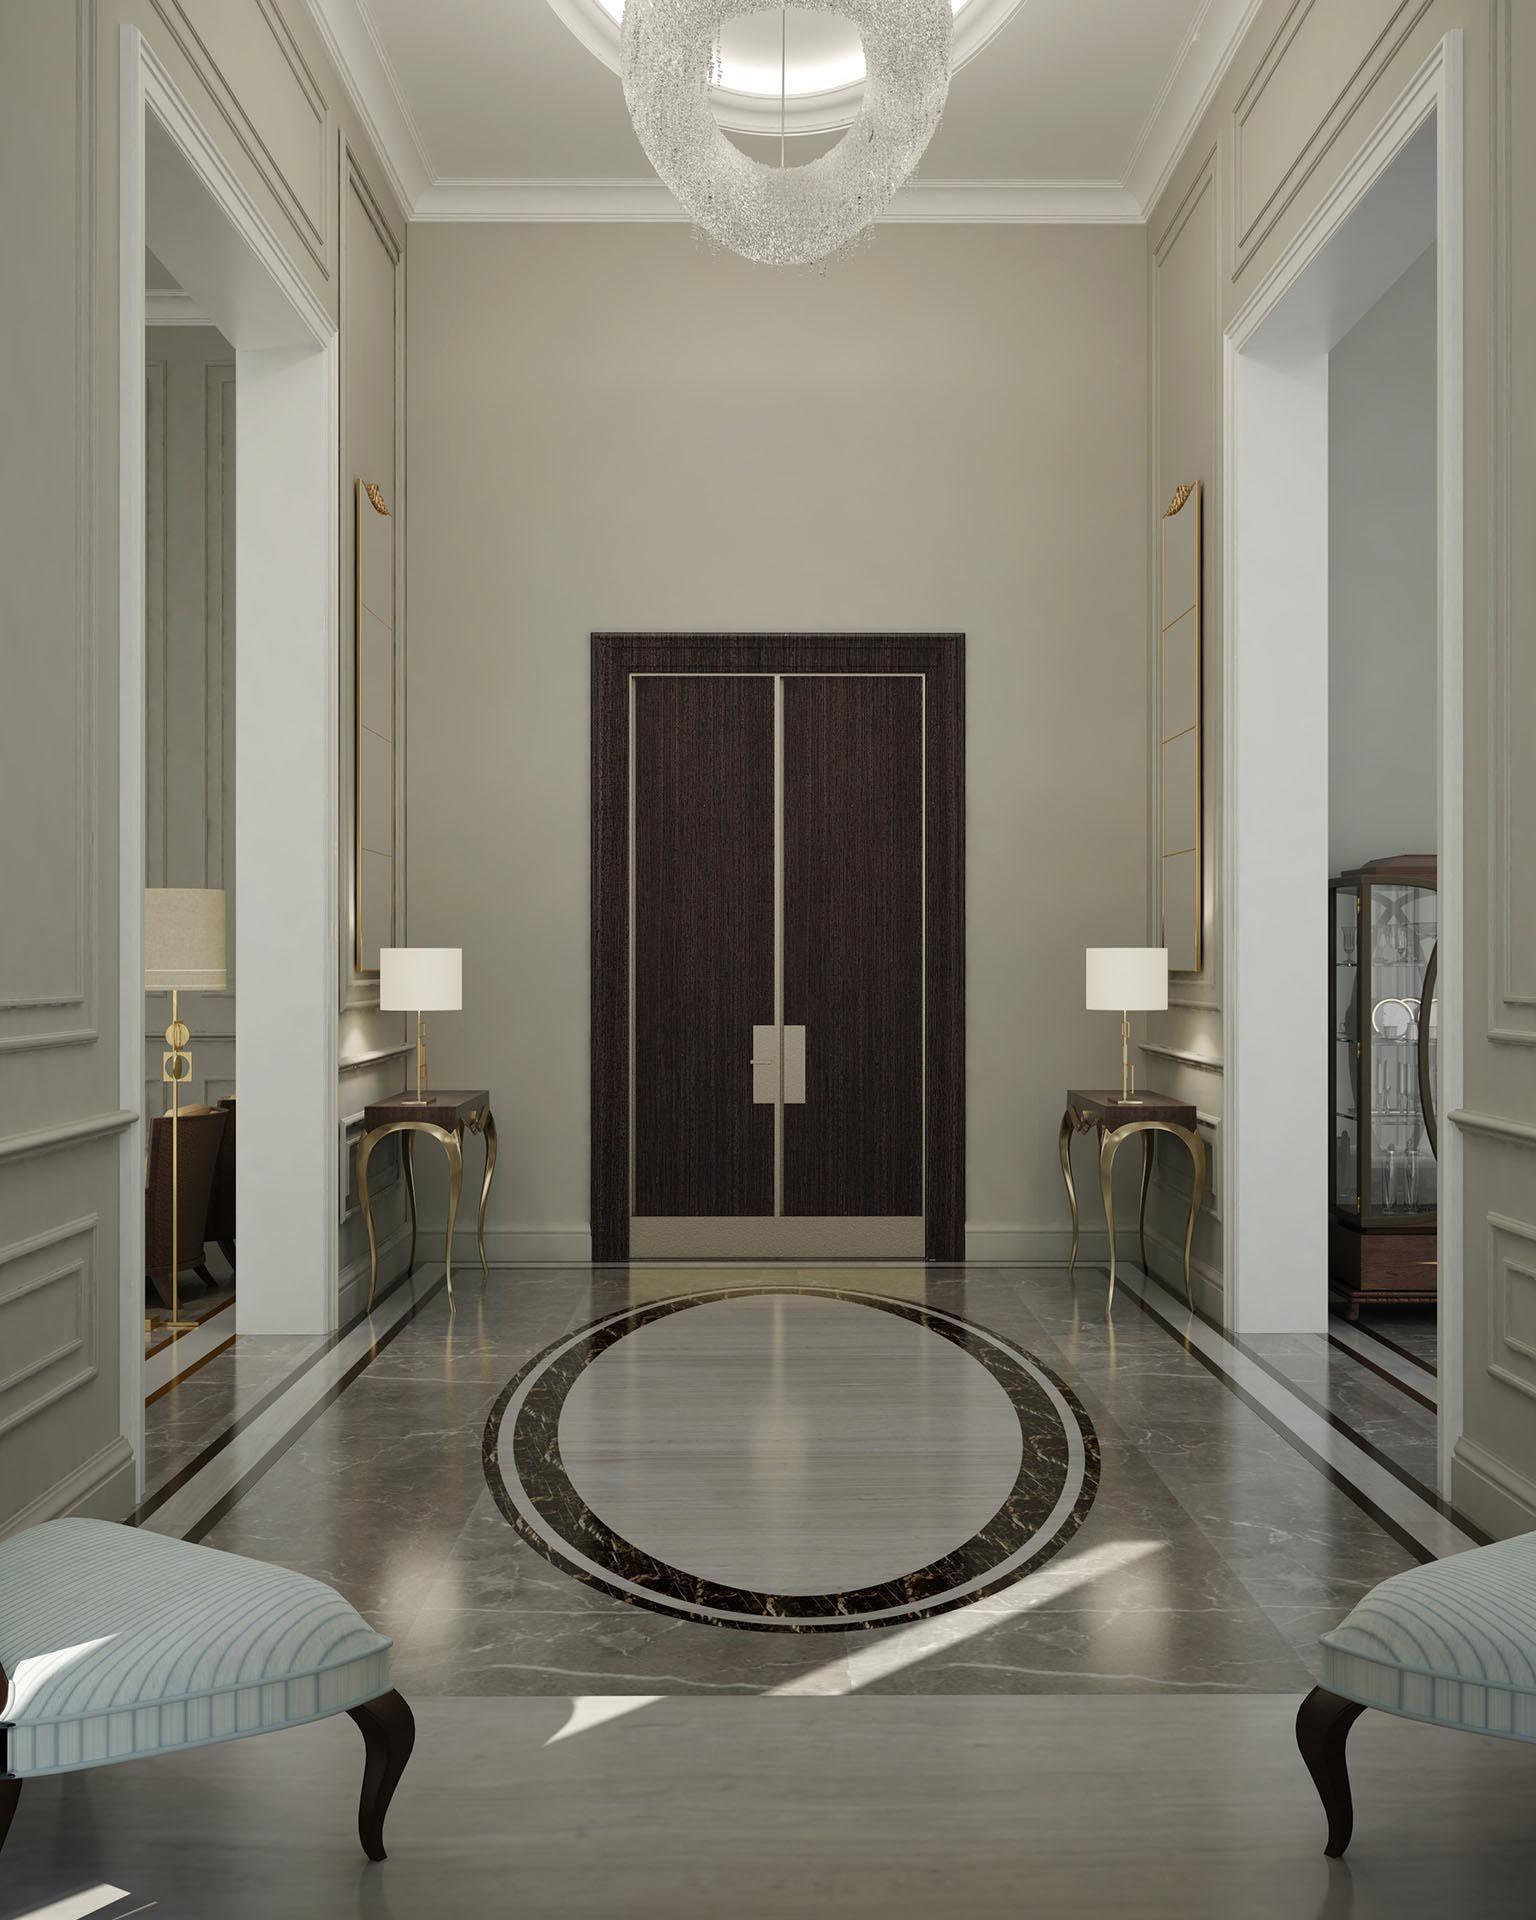 Home Interior Design Modern Hallway: Pin By Boca Do Lobo On Contemporary Decor